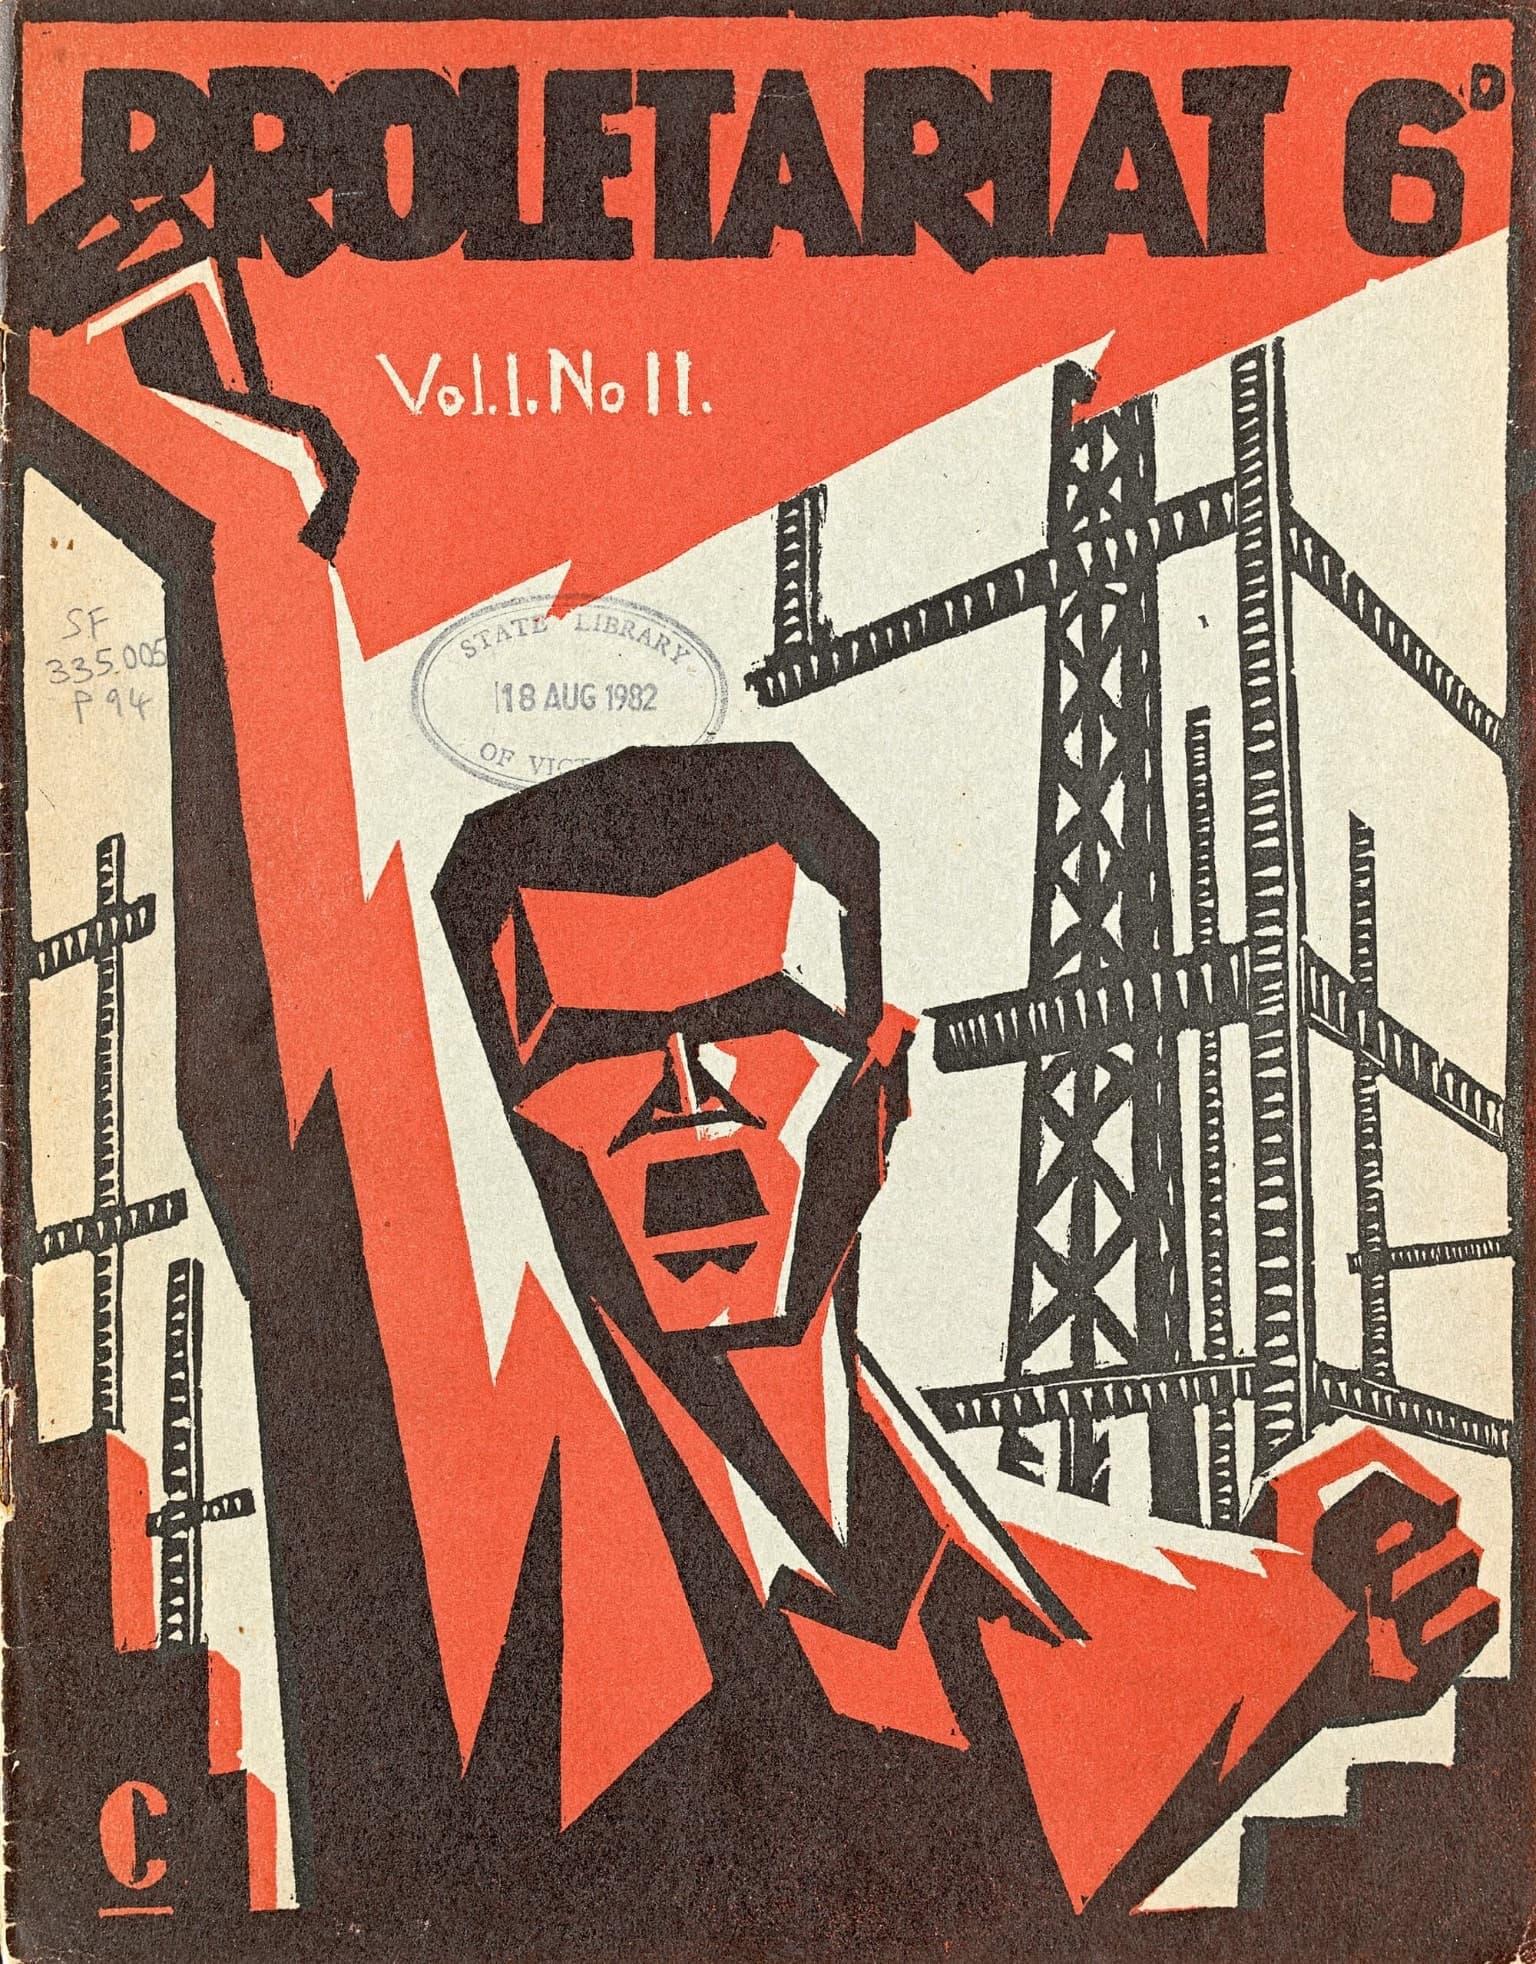 Plakatgestaltung Australien 1930er